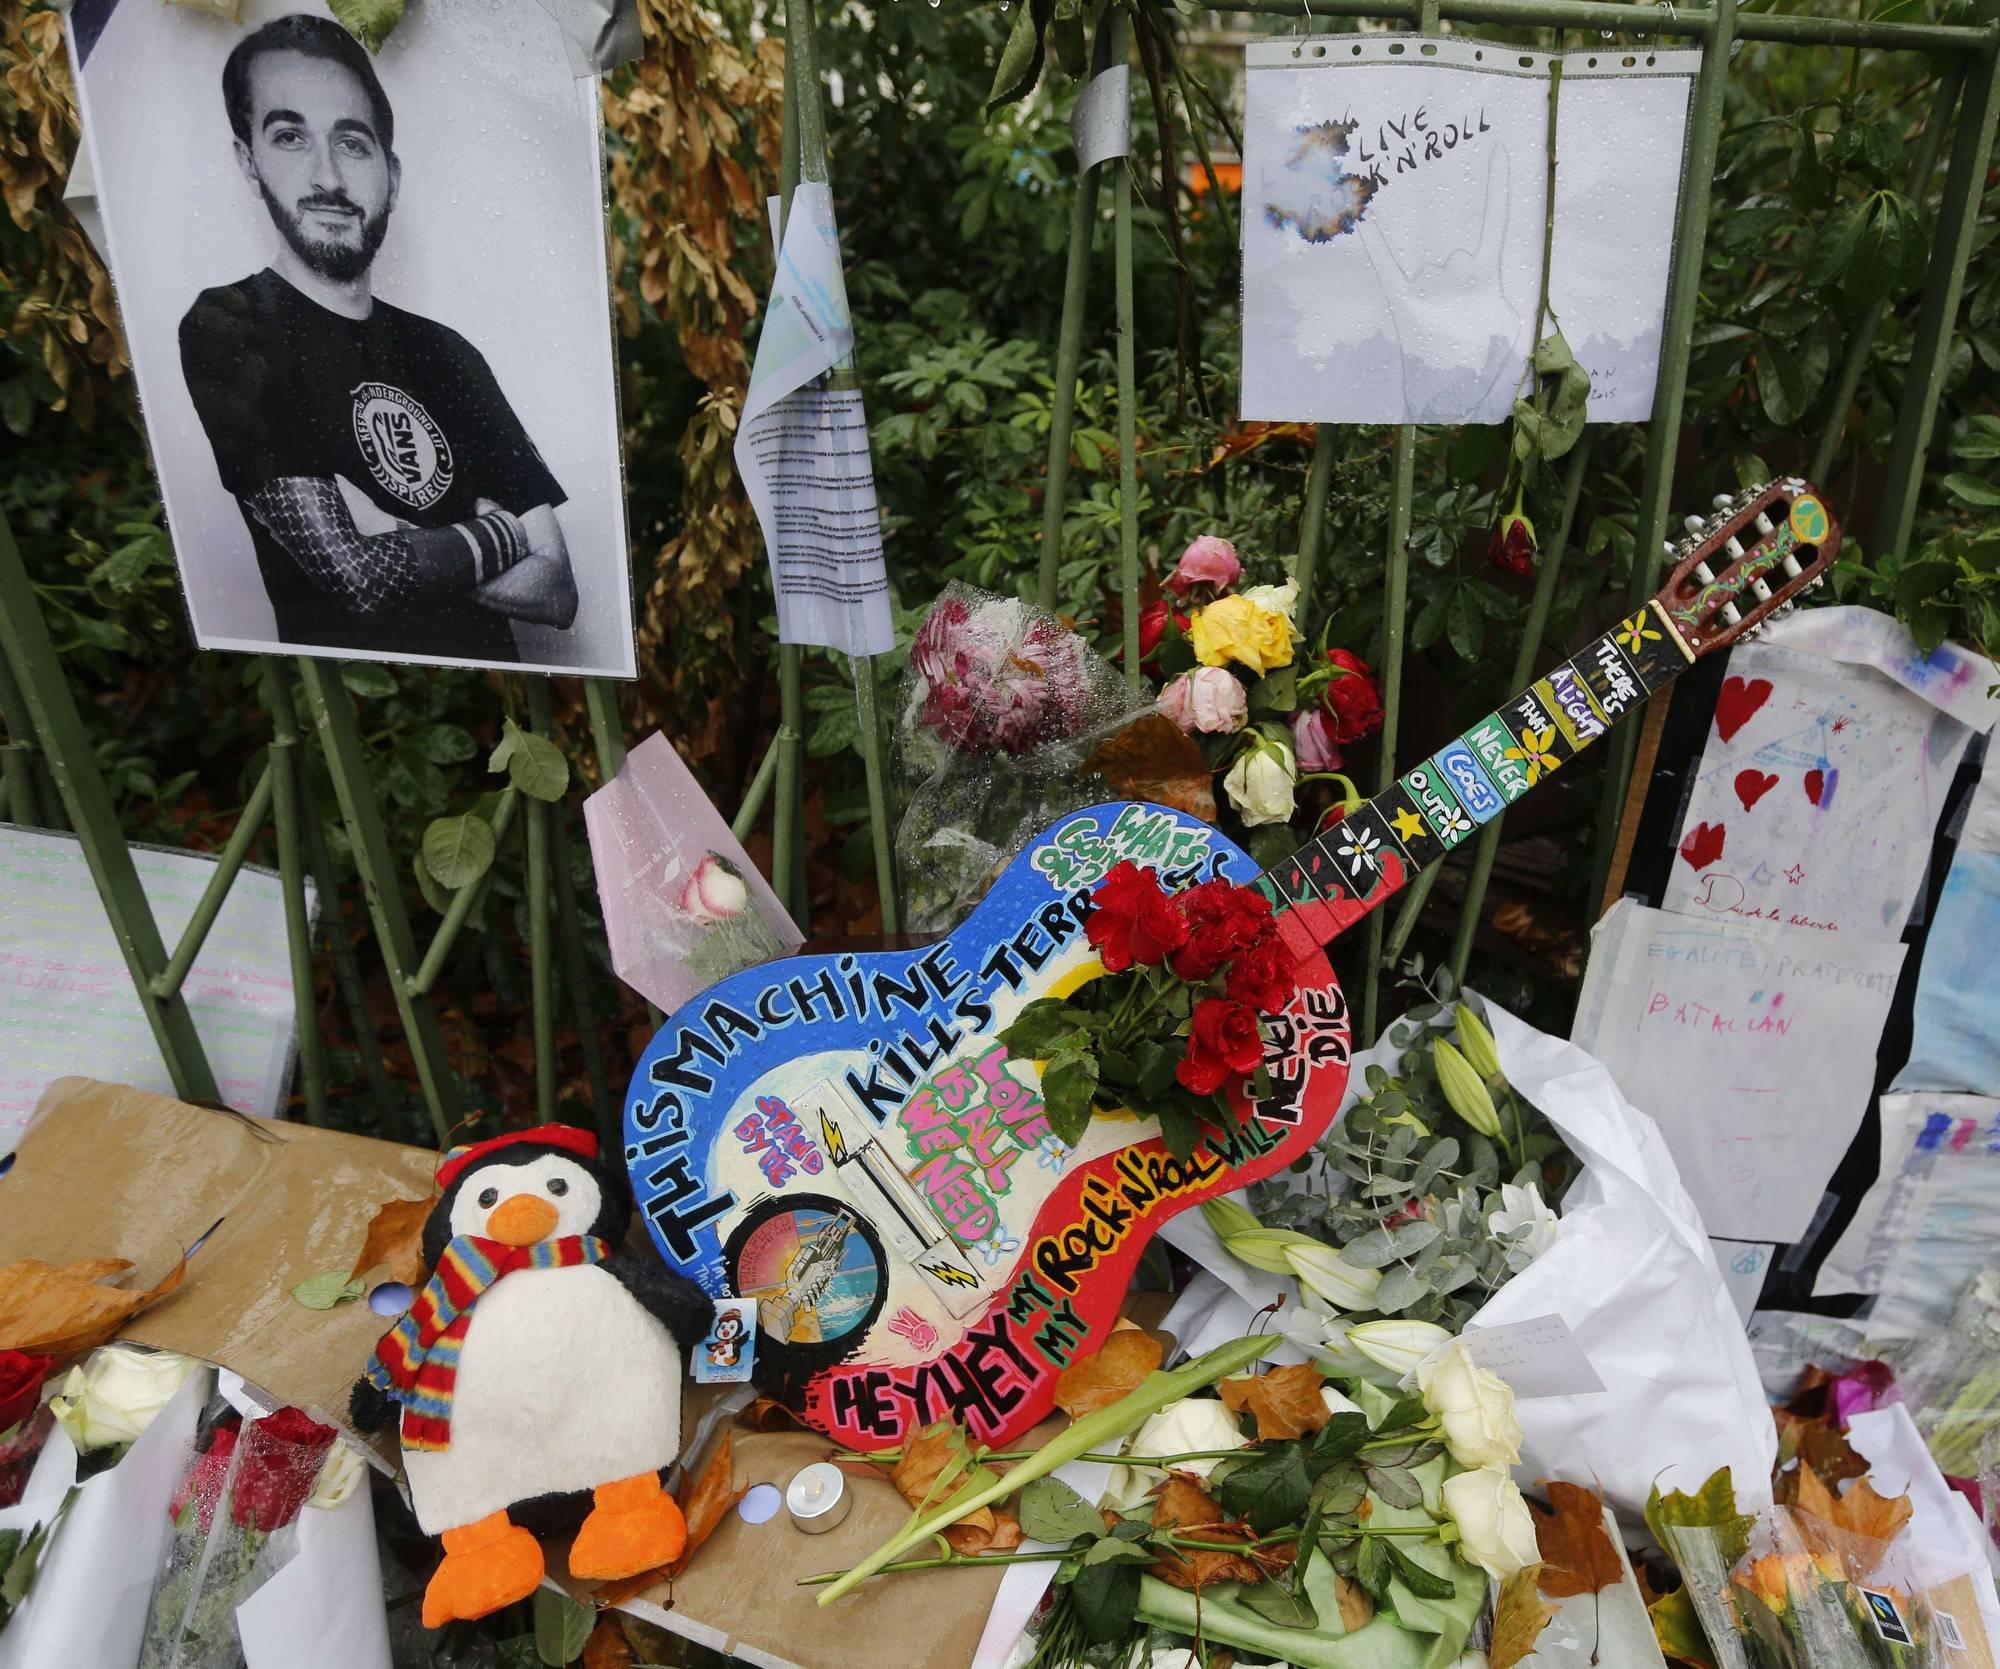 Defiant Parisians use art in the wake of terror attacks